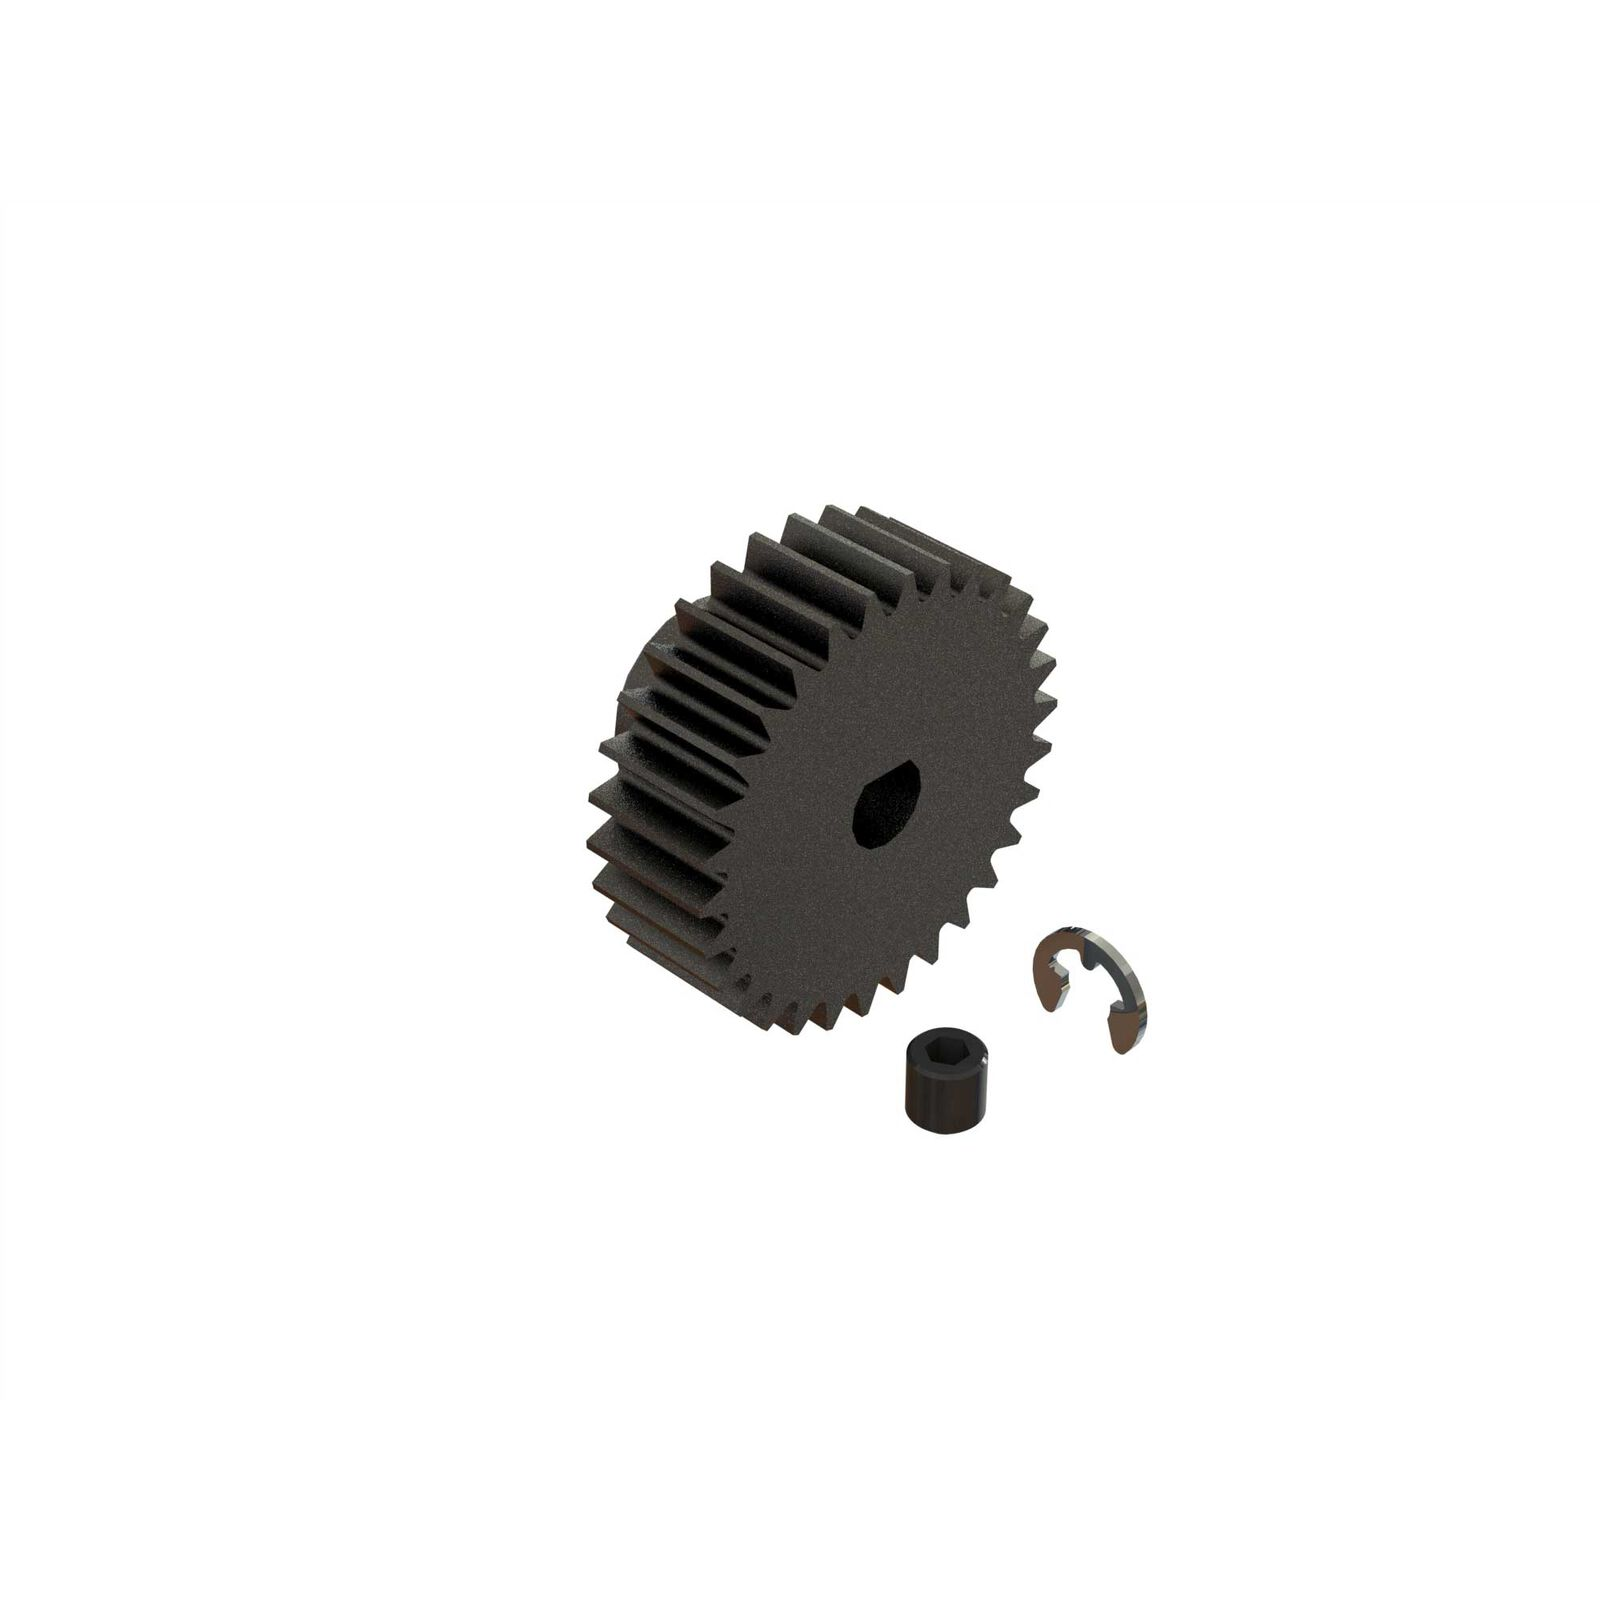 30T 0.8Mod Safe-D5 Pinion Gear